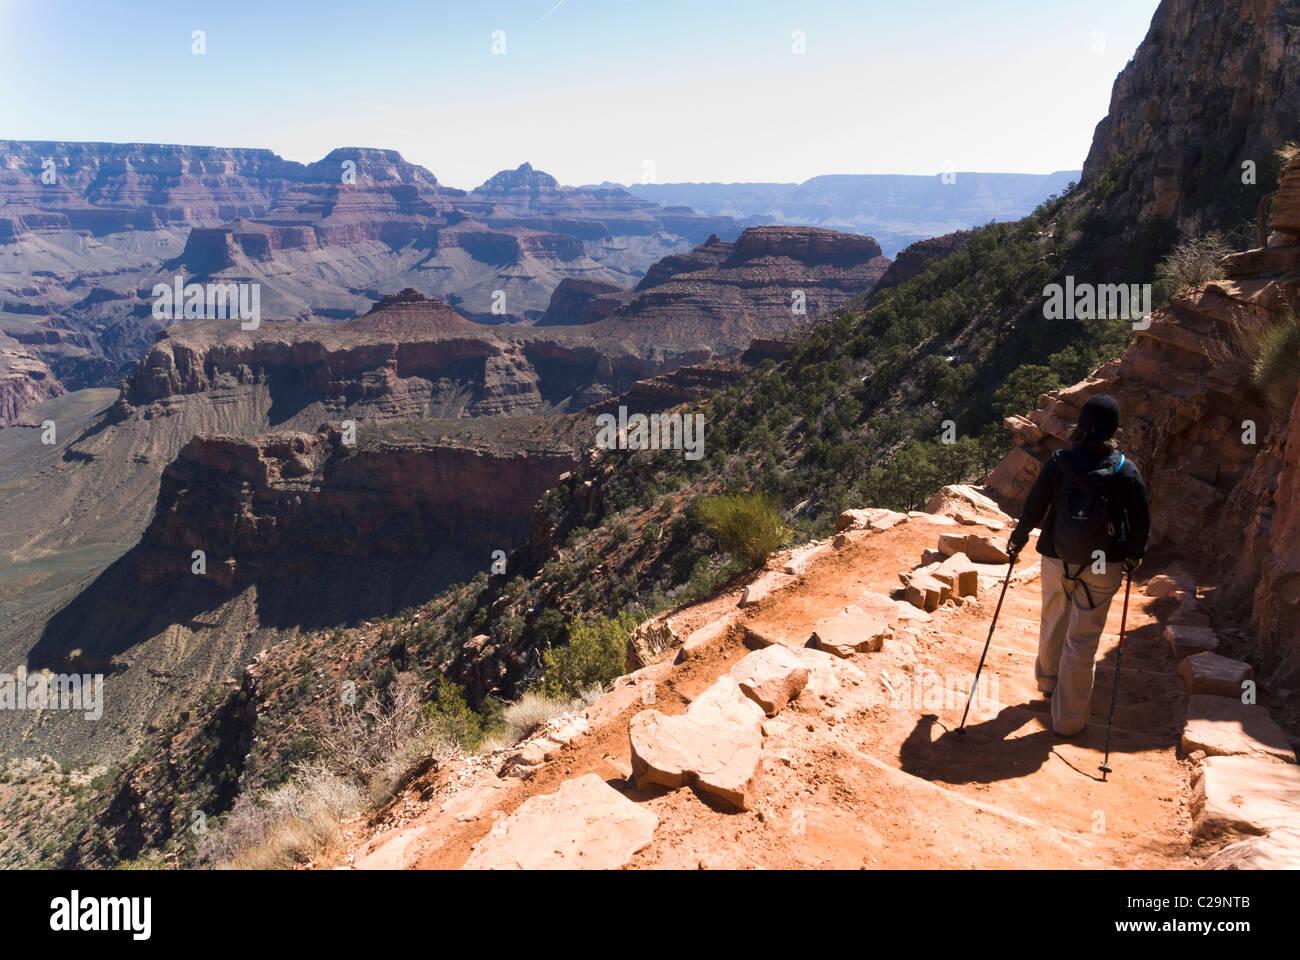 South Kaibab Trail, Grand Canyon National Park, Arizona, USA. - Stock Image